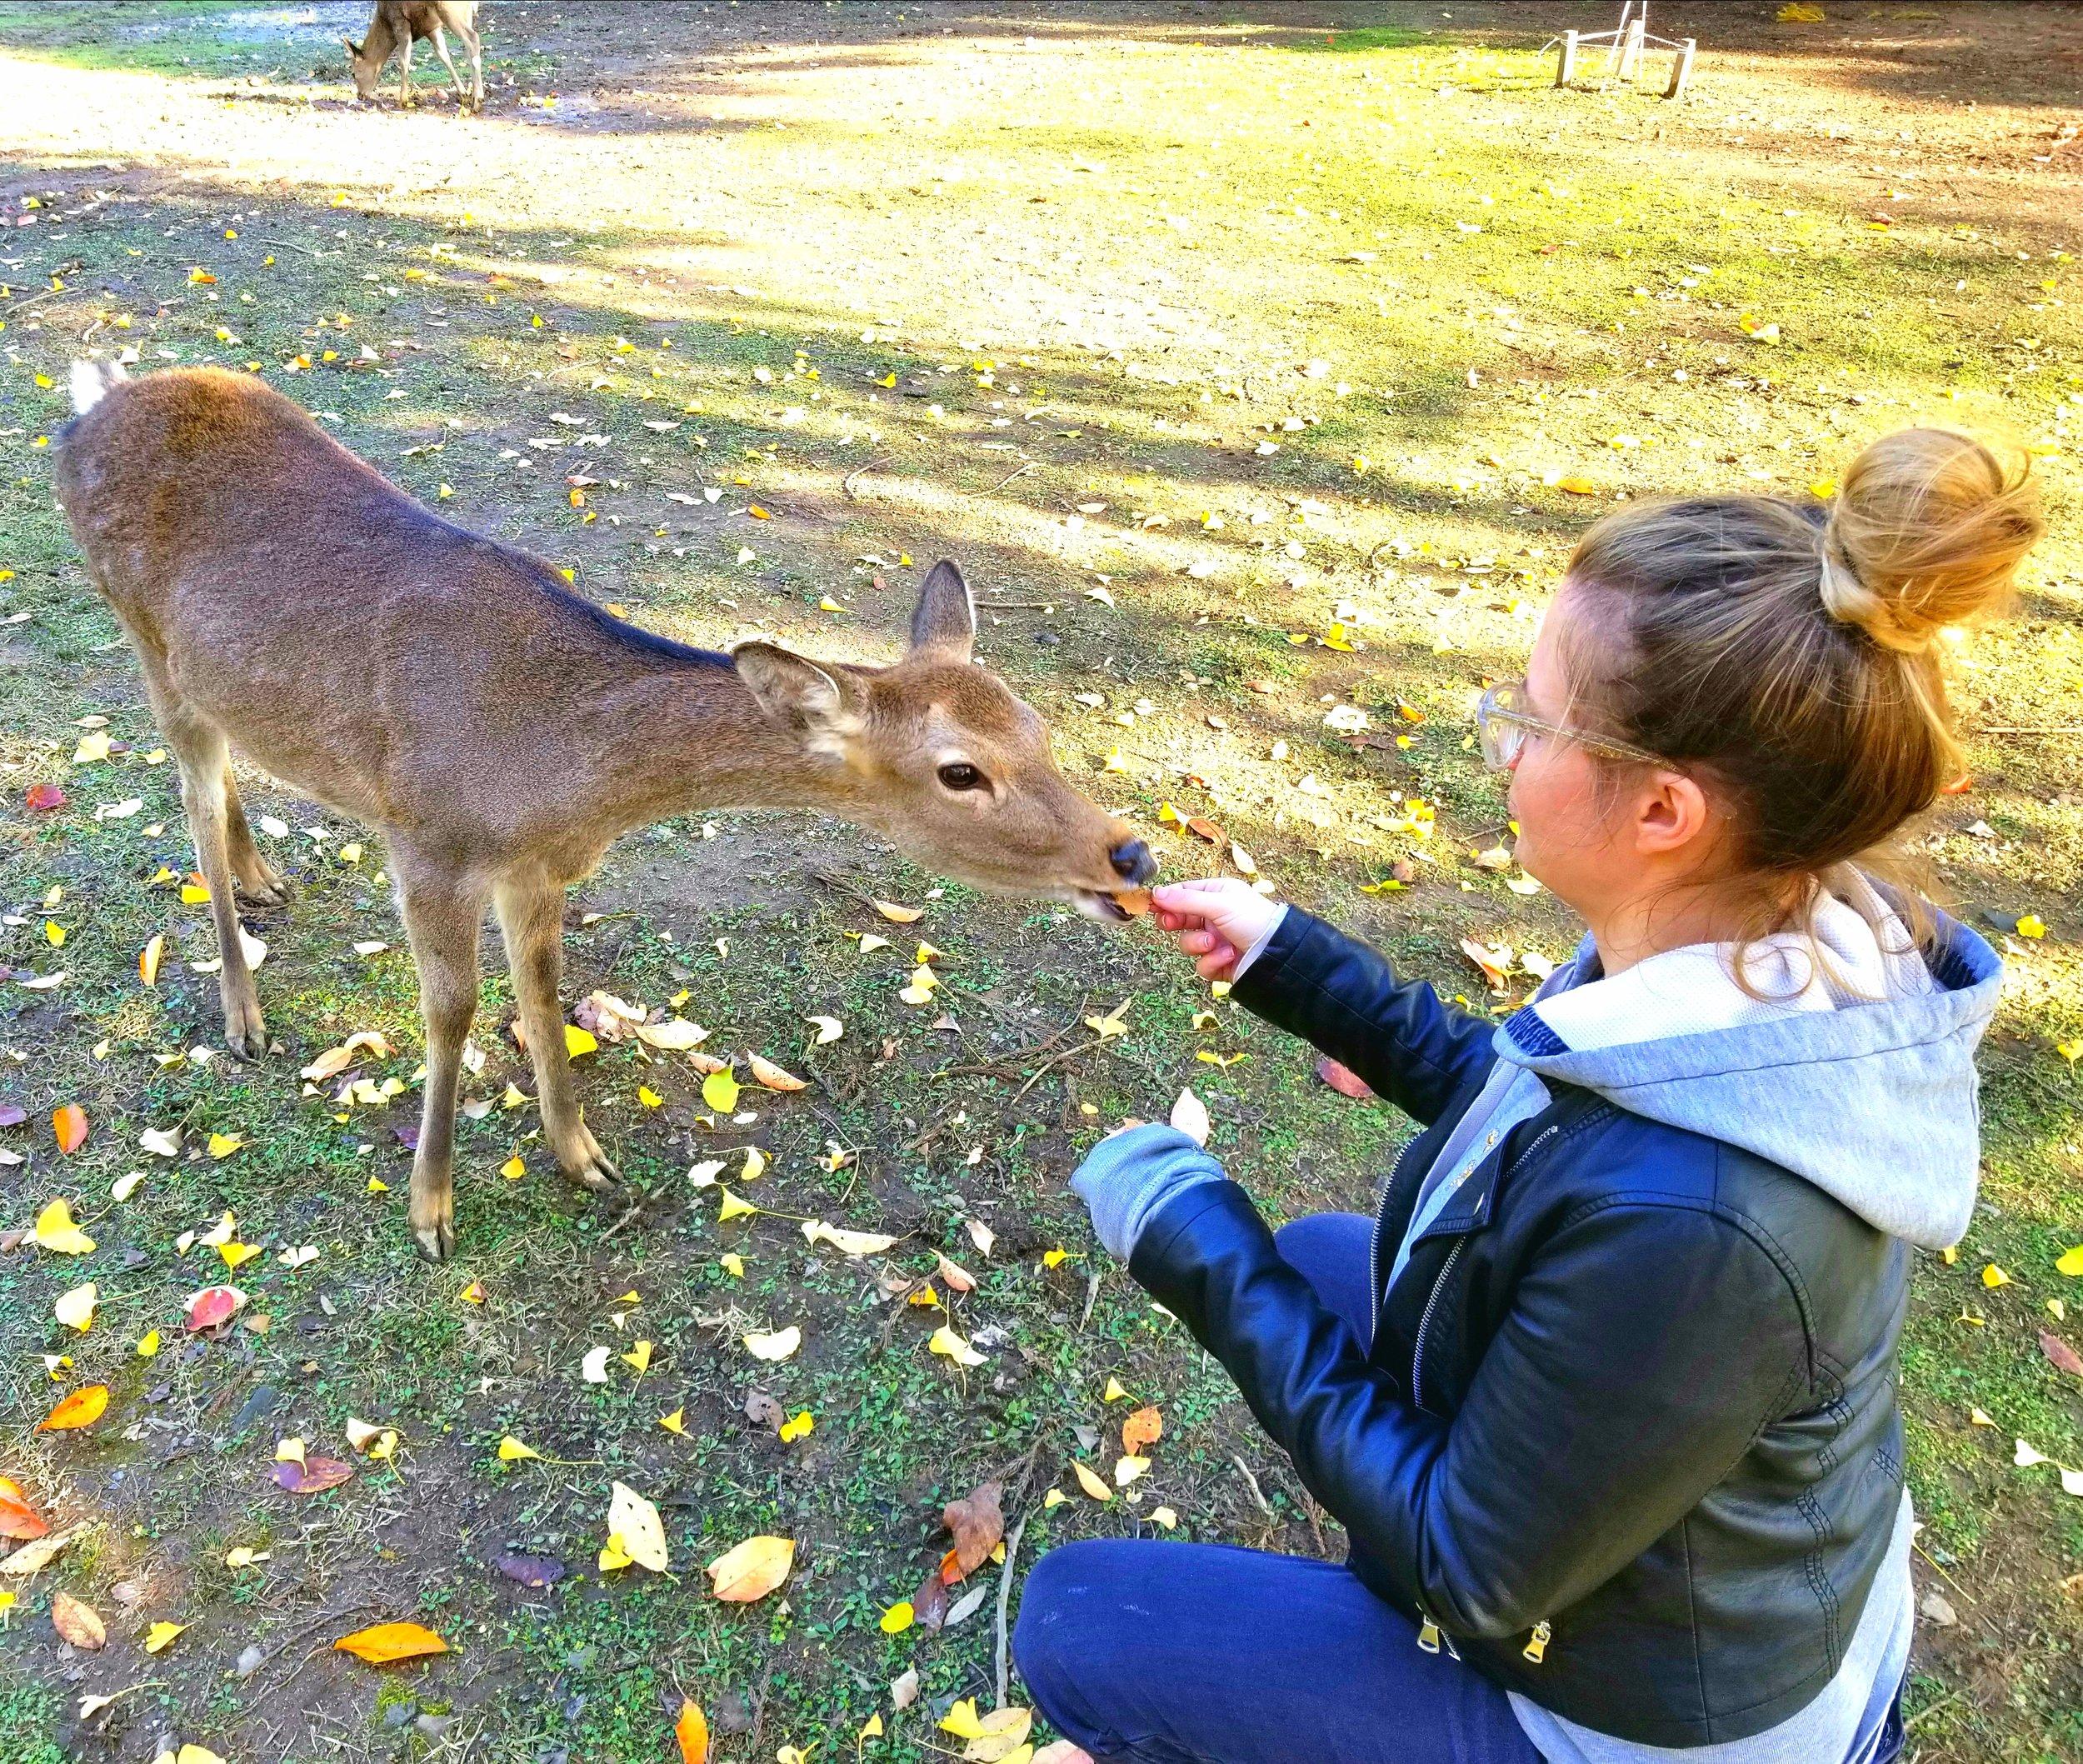 uprooted-traveler-vegan-guide-to-kyoto-nara-park-deer